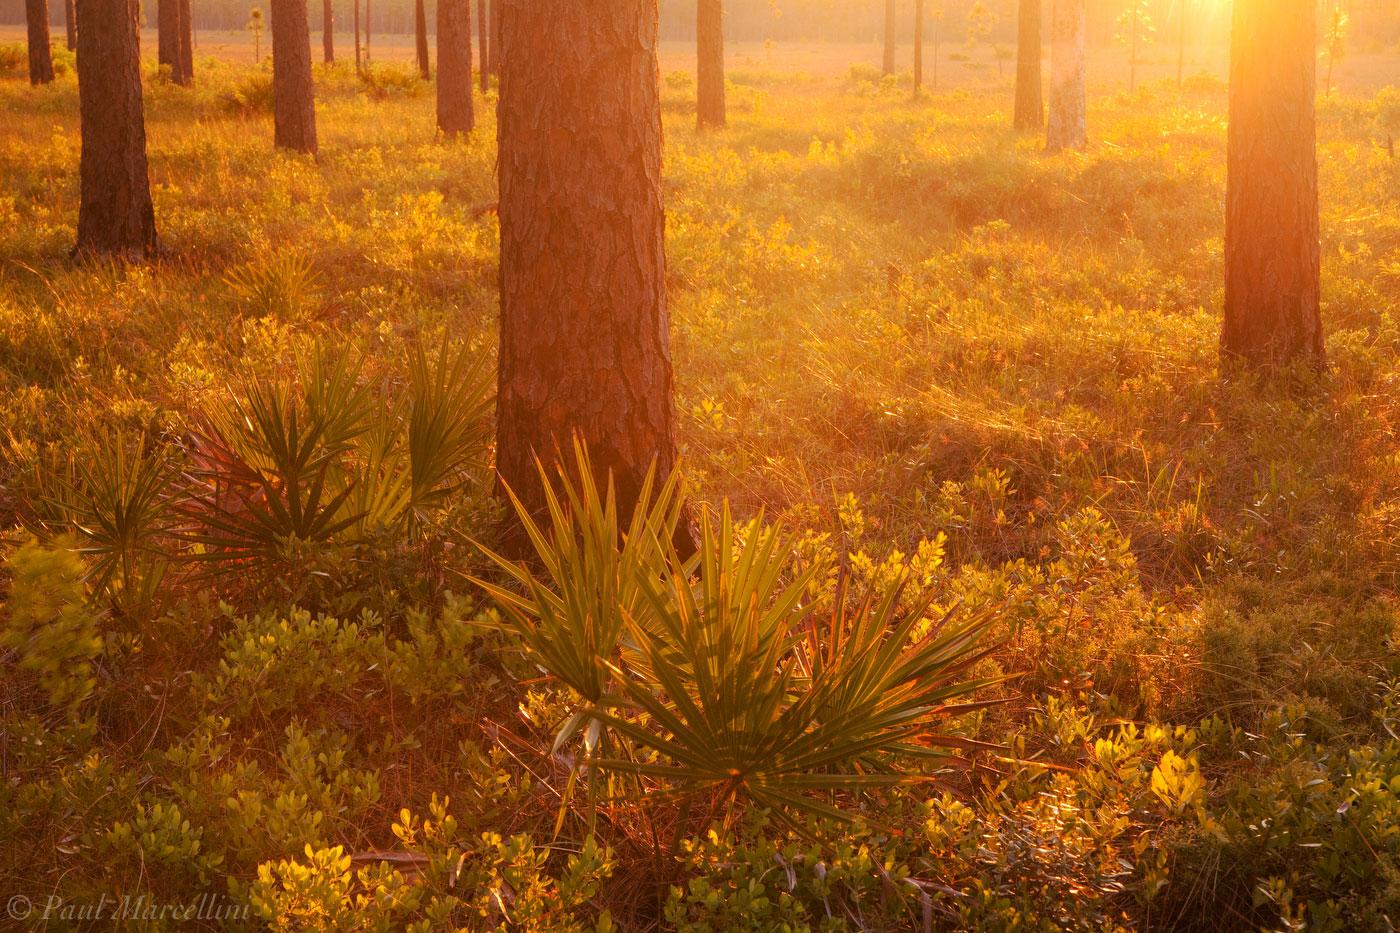 Apalachicola National Forest, Florida, Longleaf Pine, Pinus palustris, sunset, north florida, nature, photography, photo